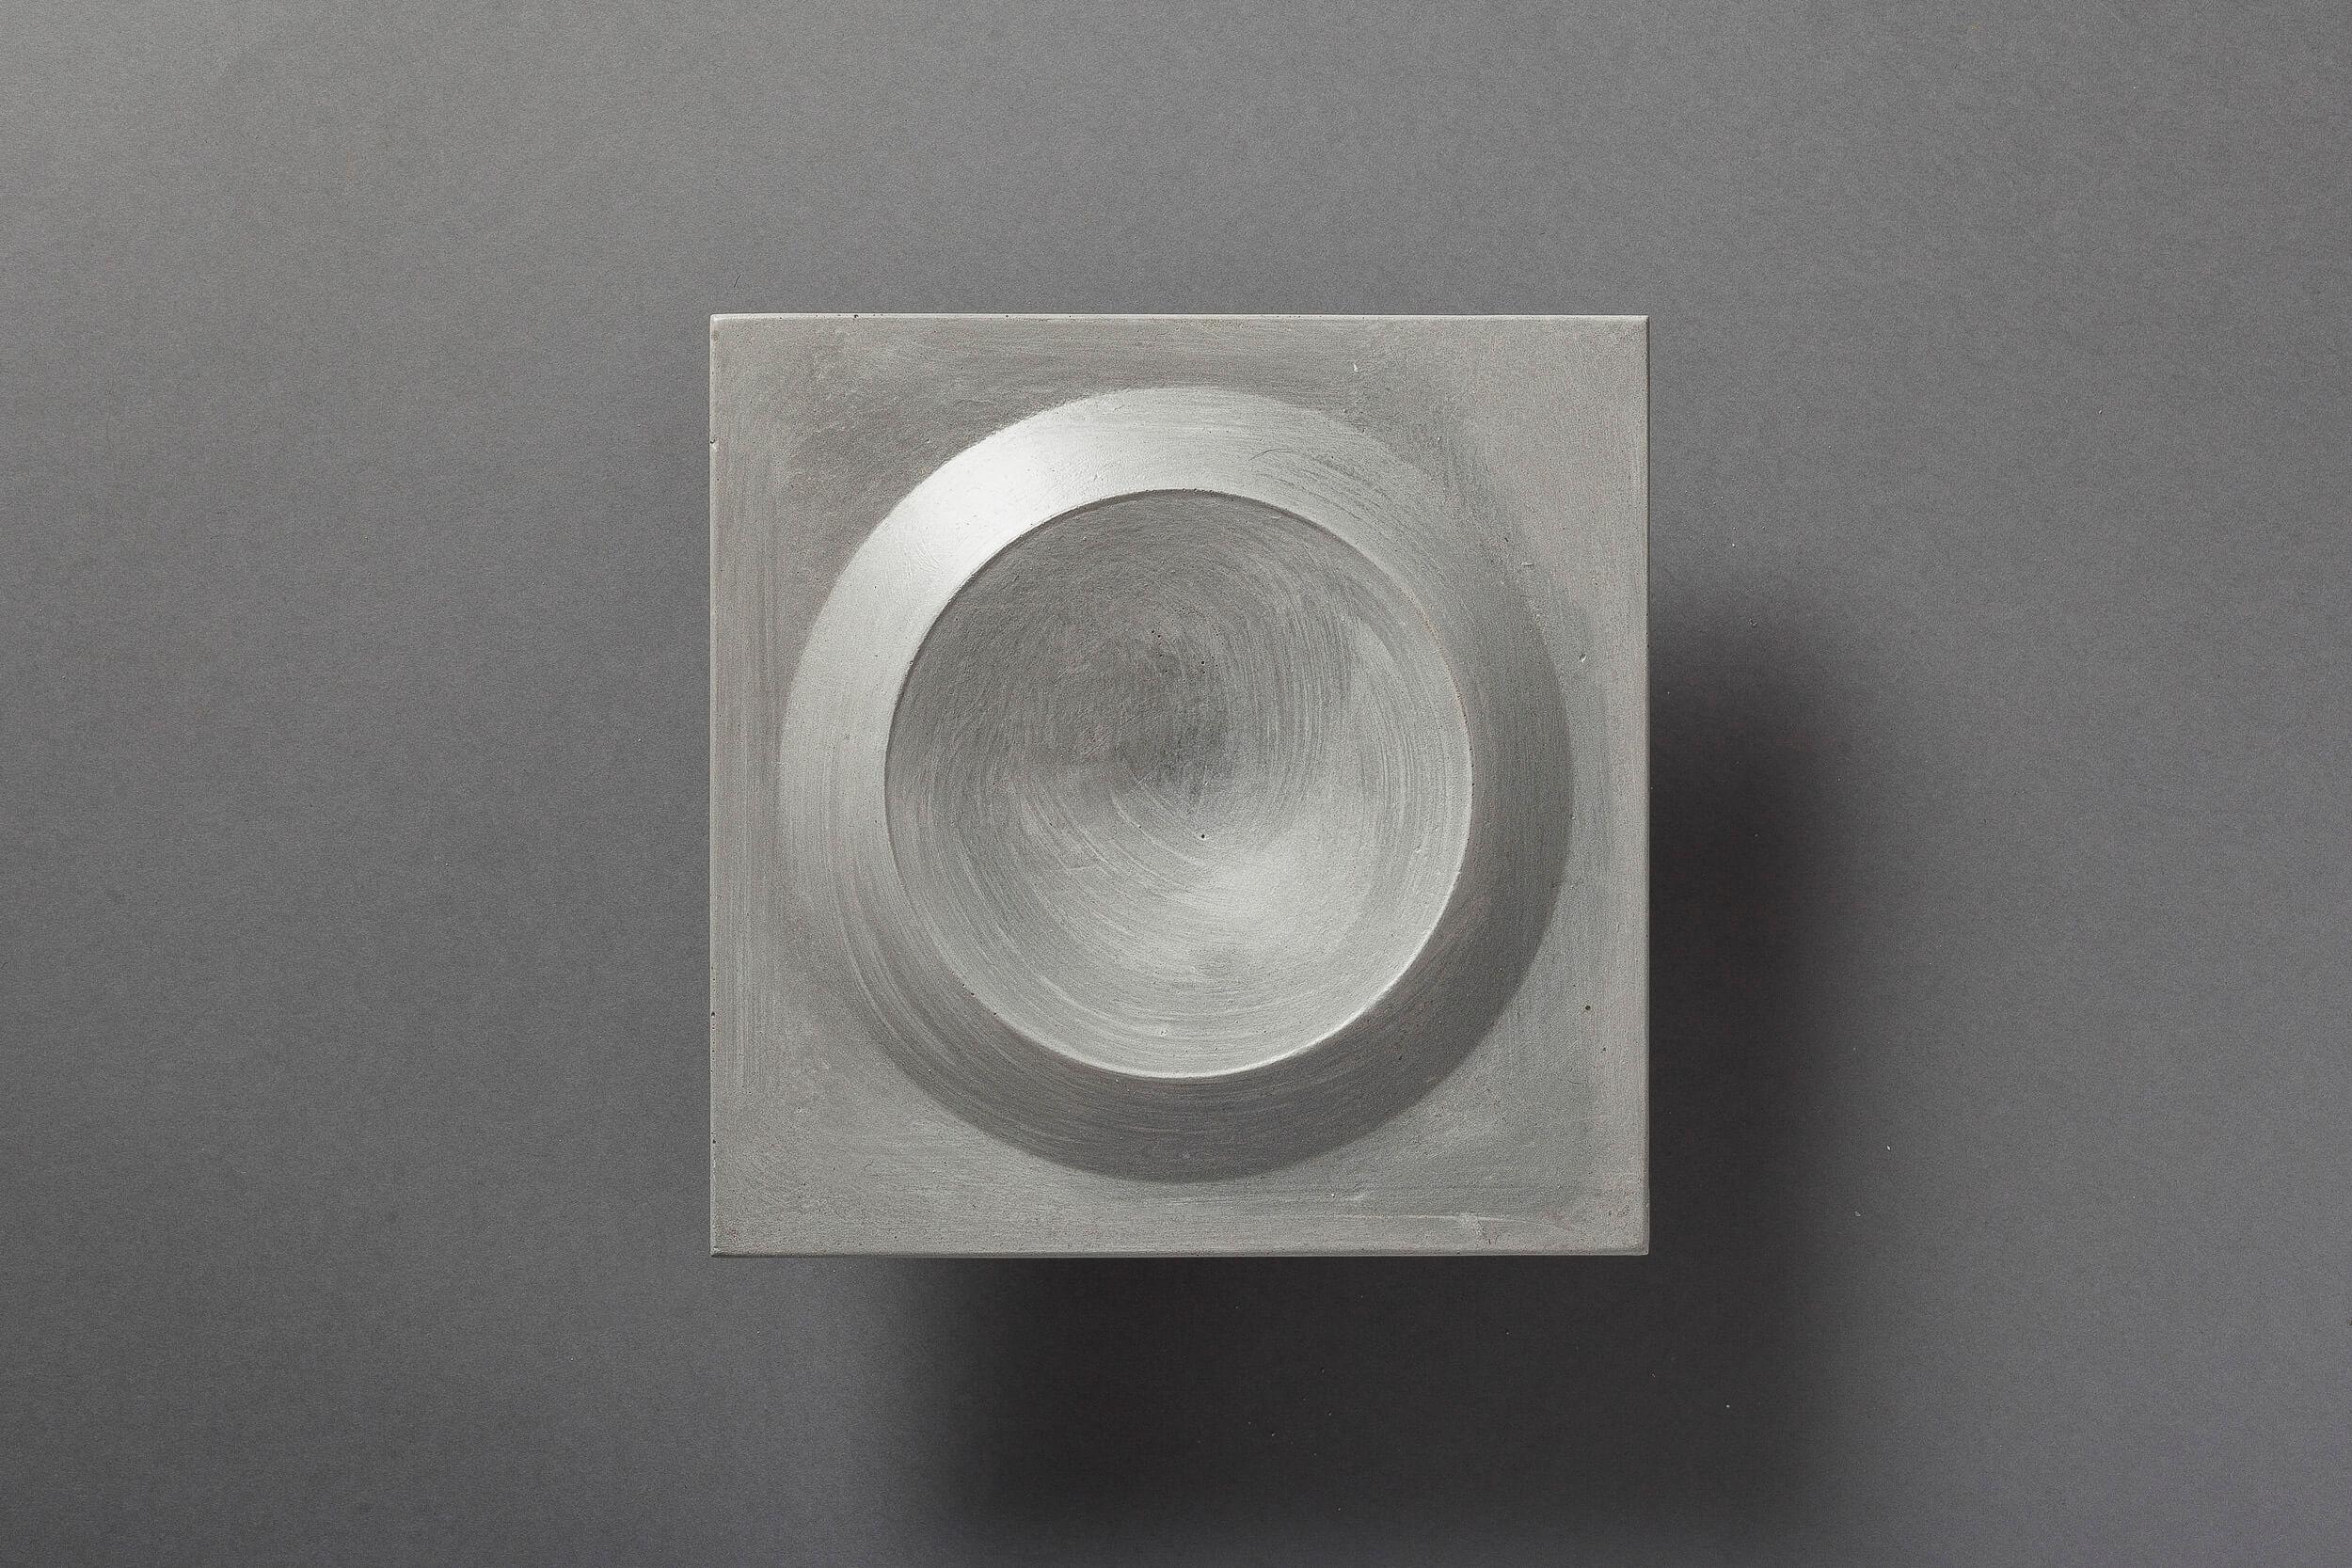 Plaster_studio_tile_03_concrete